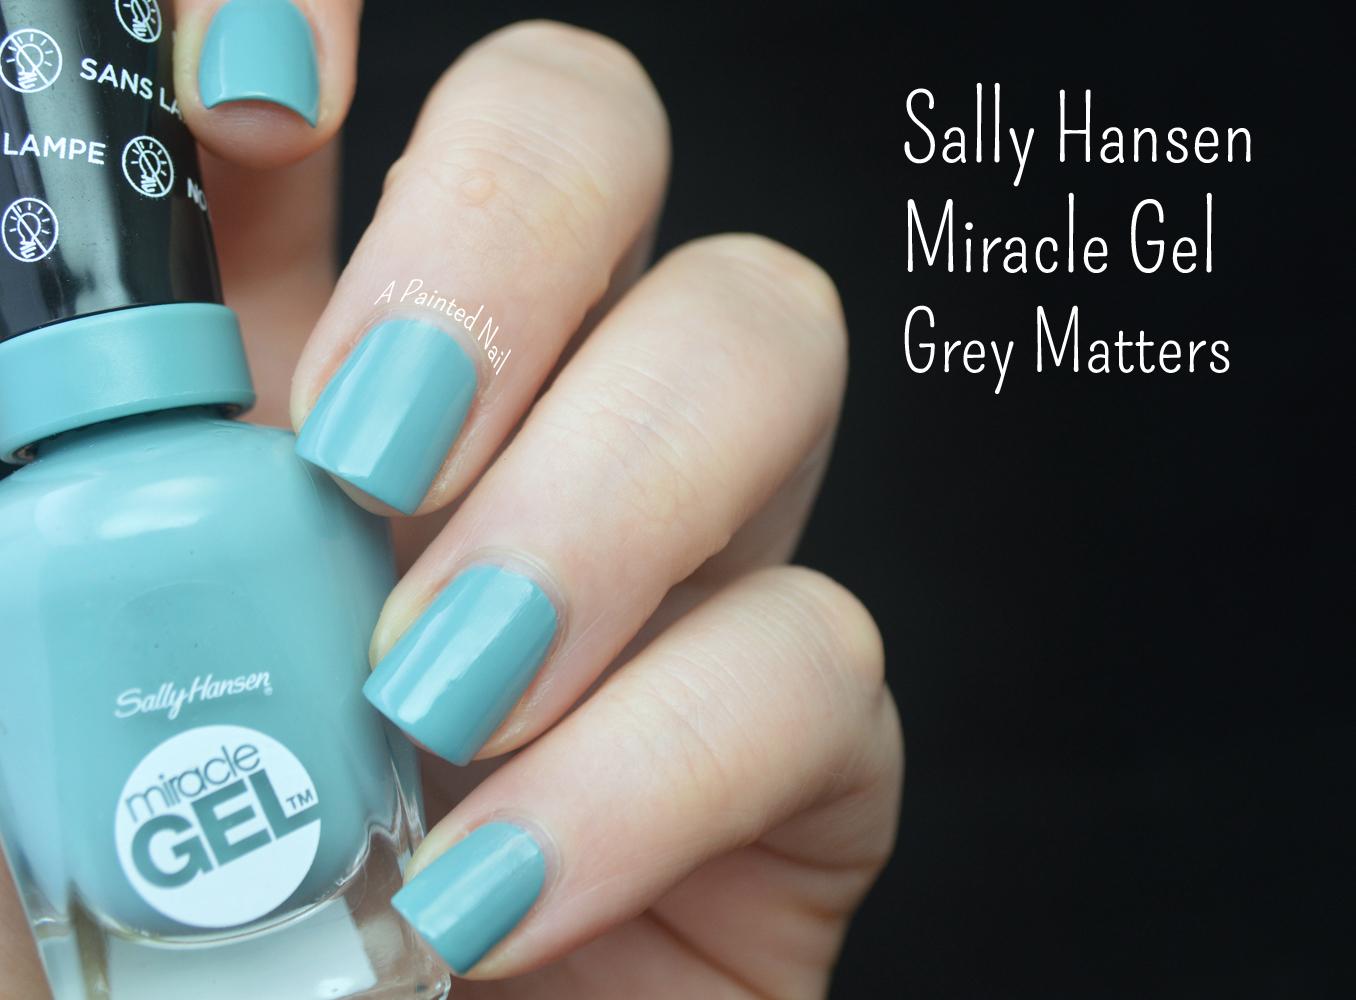 A Painted Nail: Sally Hansen Miracle Gel Polish System Grey Matters